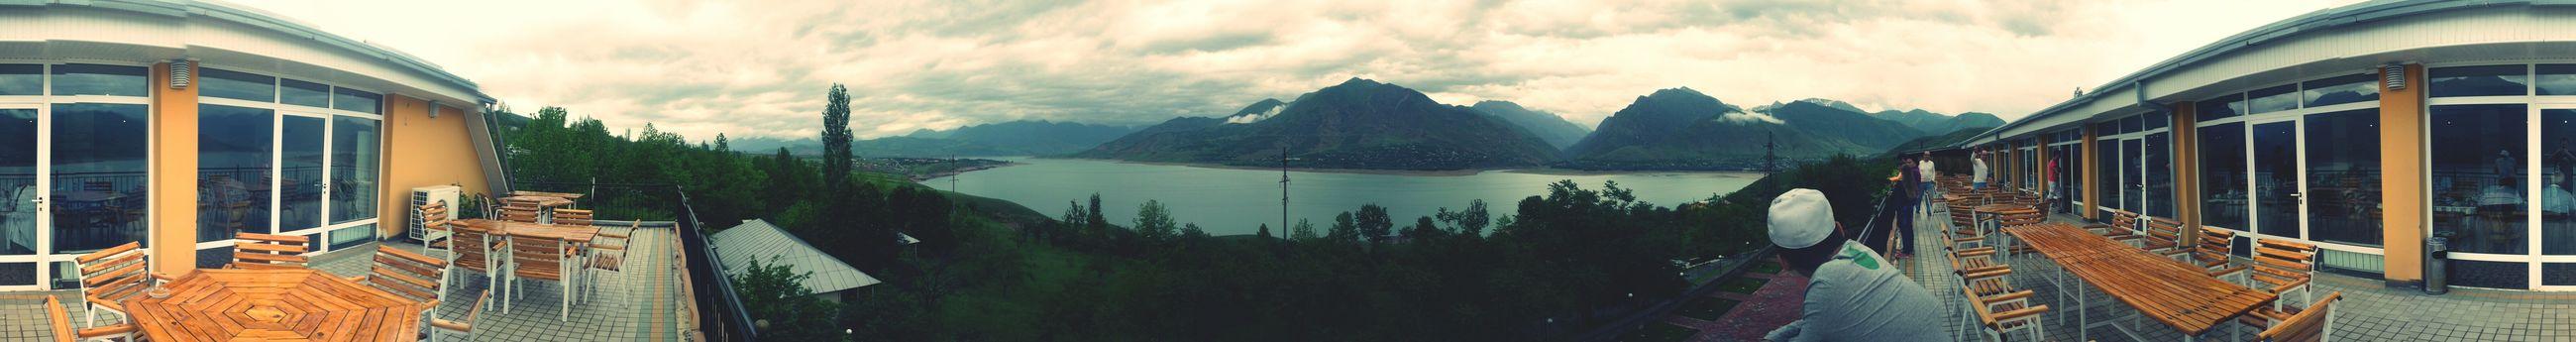 My Country In A Photo Enjoying Life Mountain Park Nature Lake Water Beautiful Taking Photos Avenue panorama